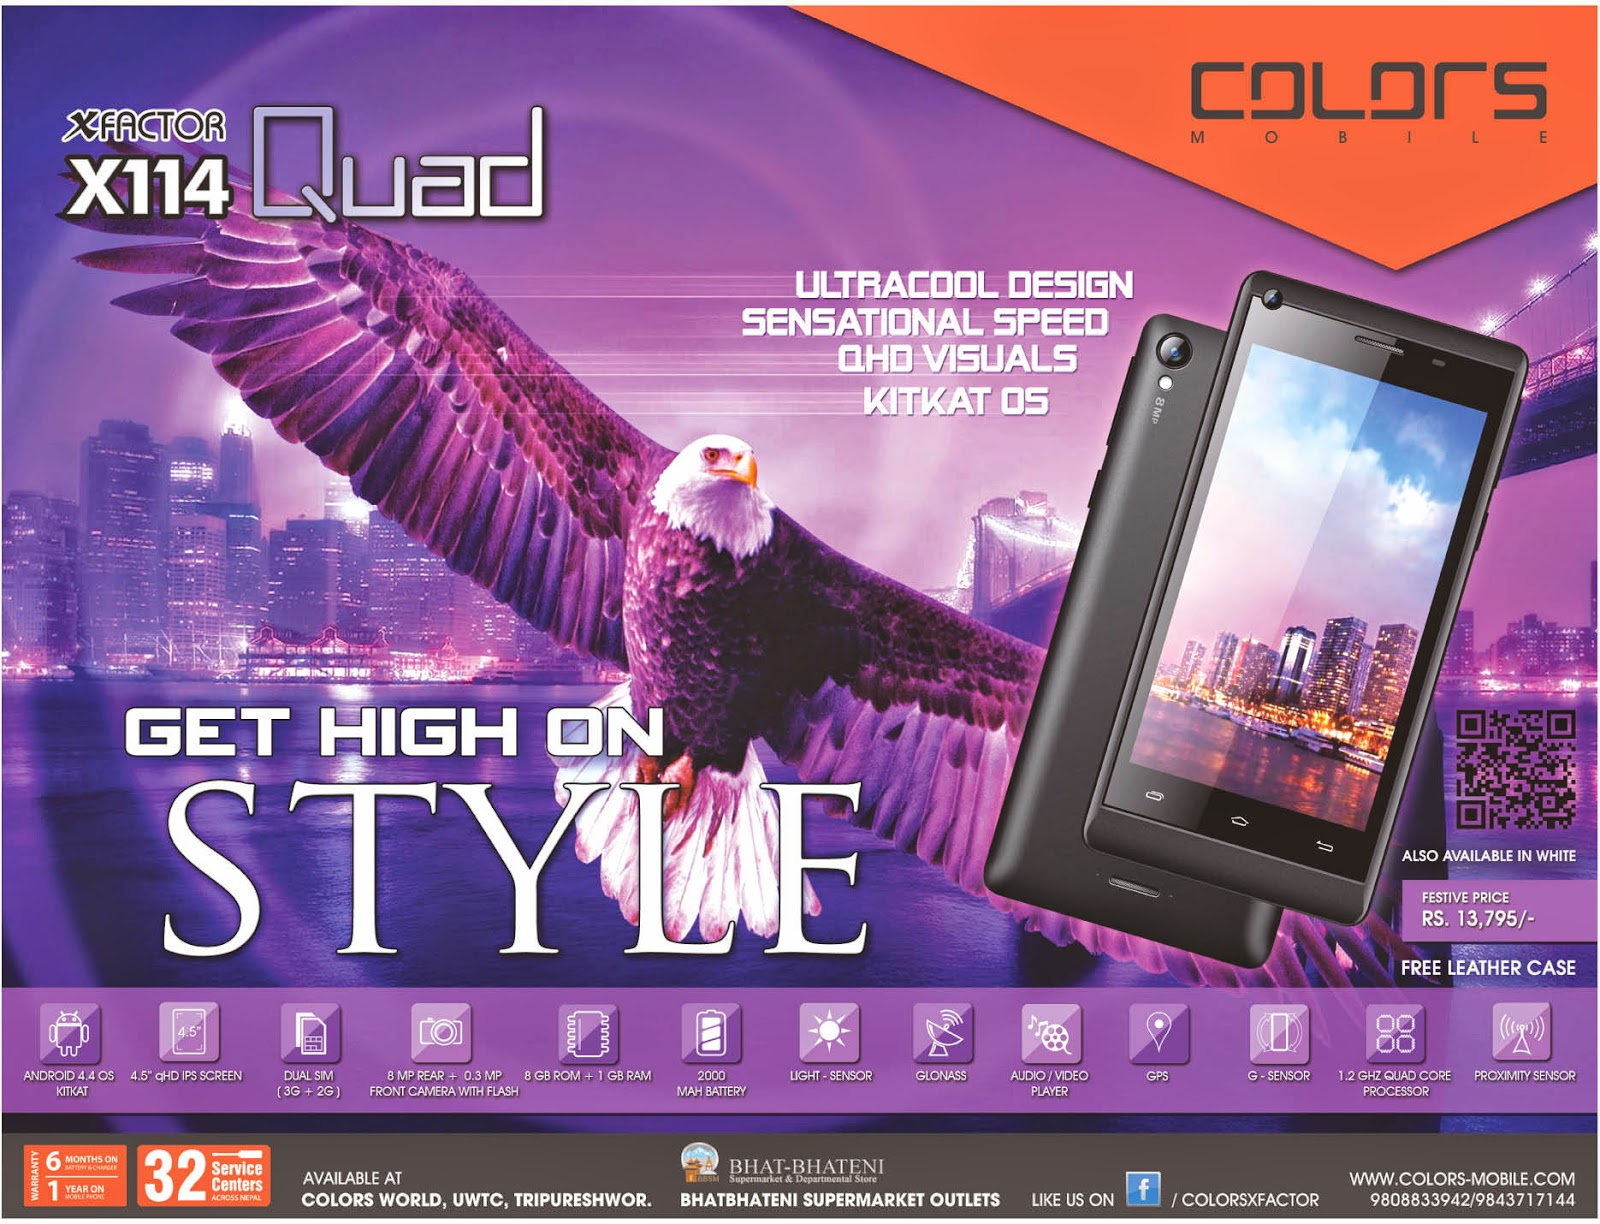 COLORS-XFACTOR-X114-Quad-Price-Nepal